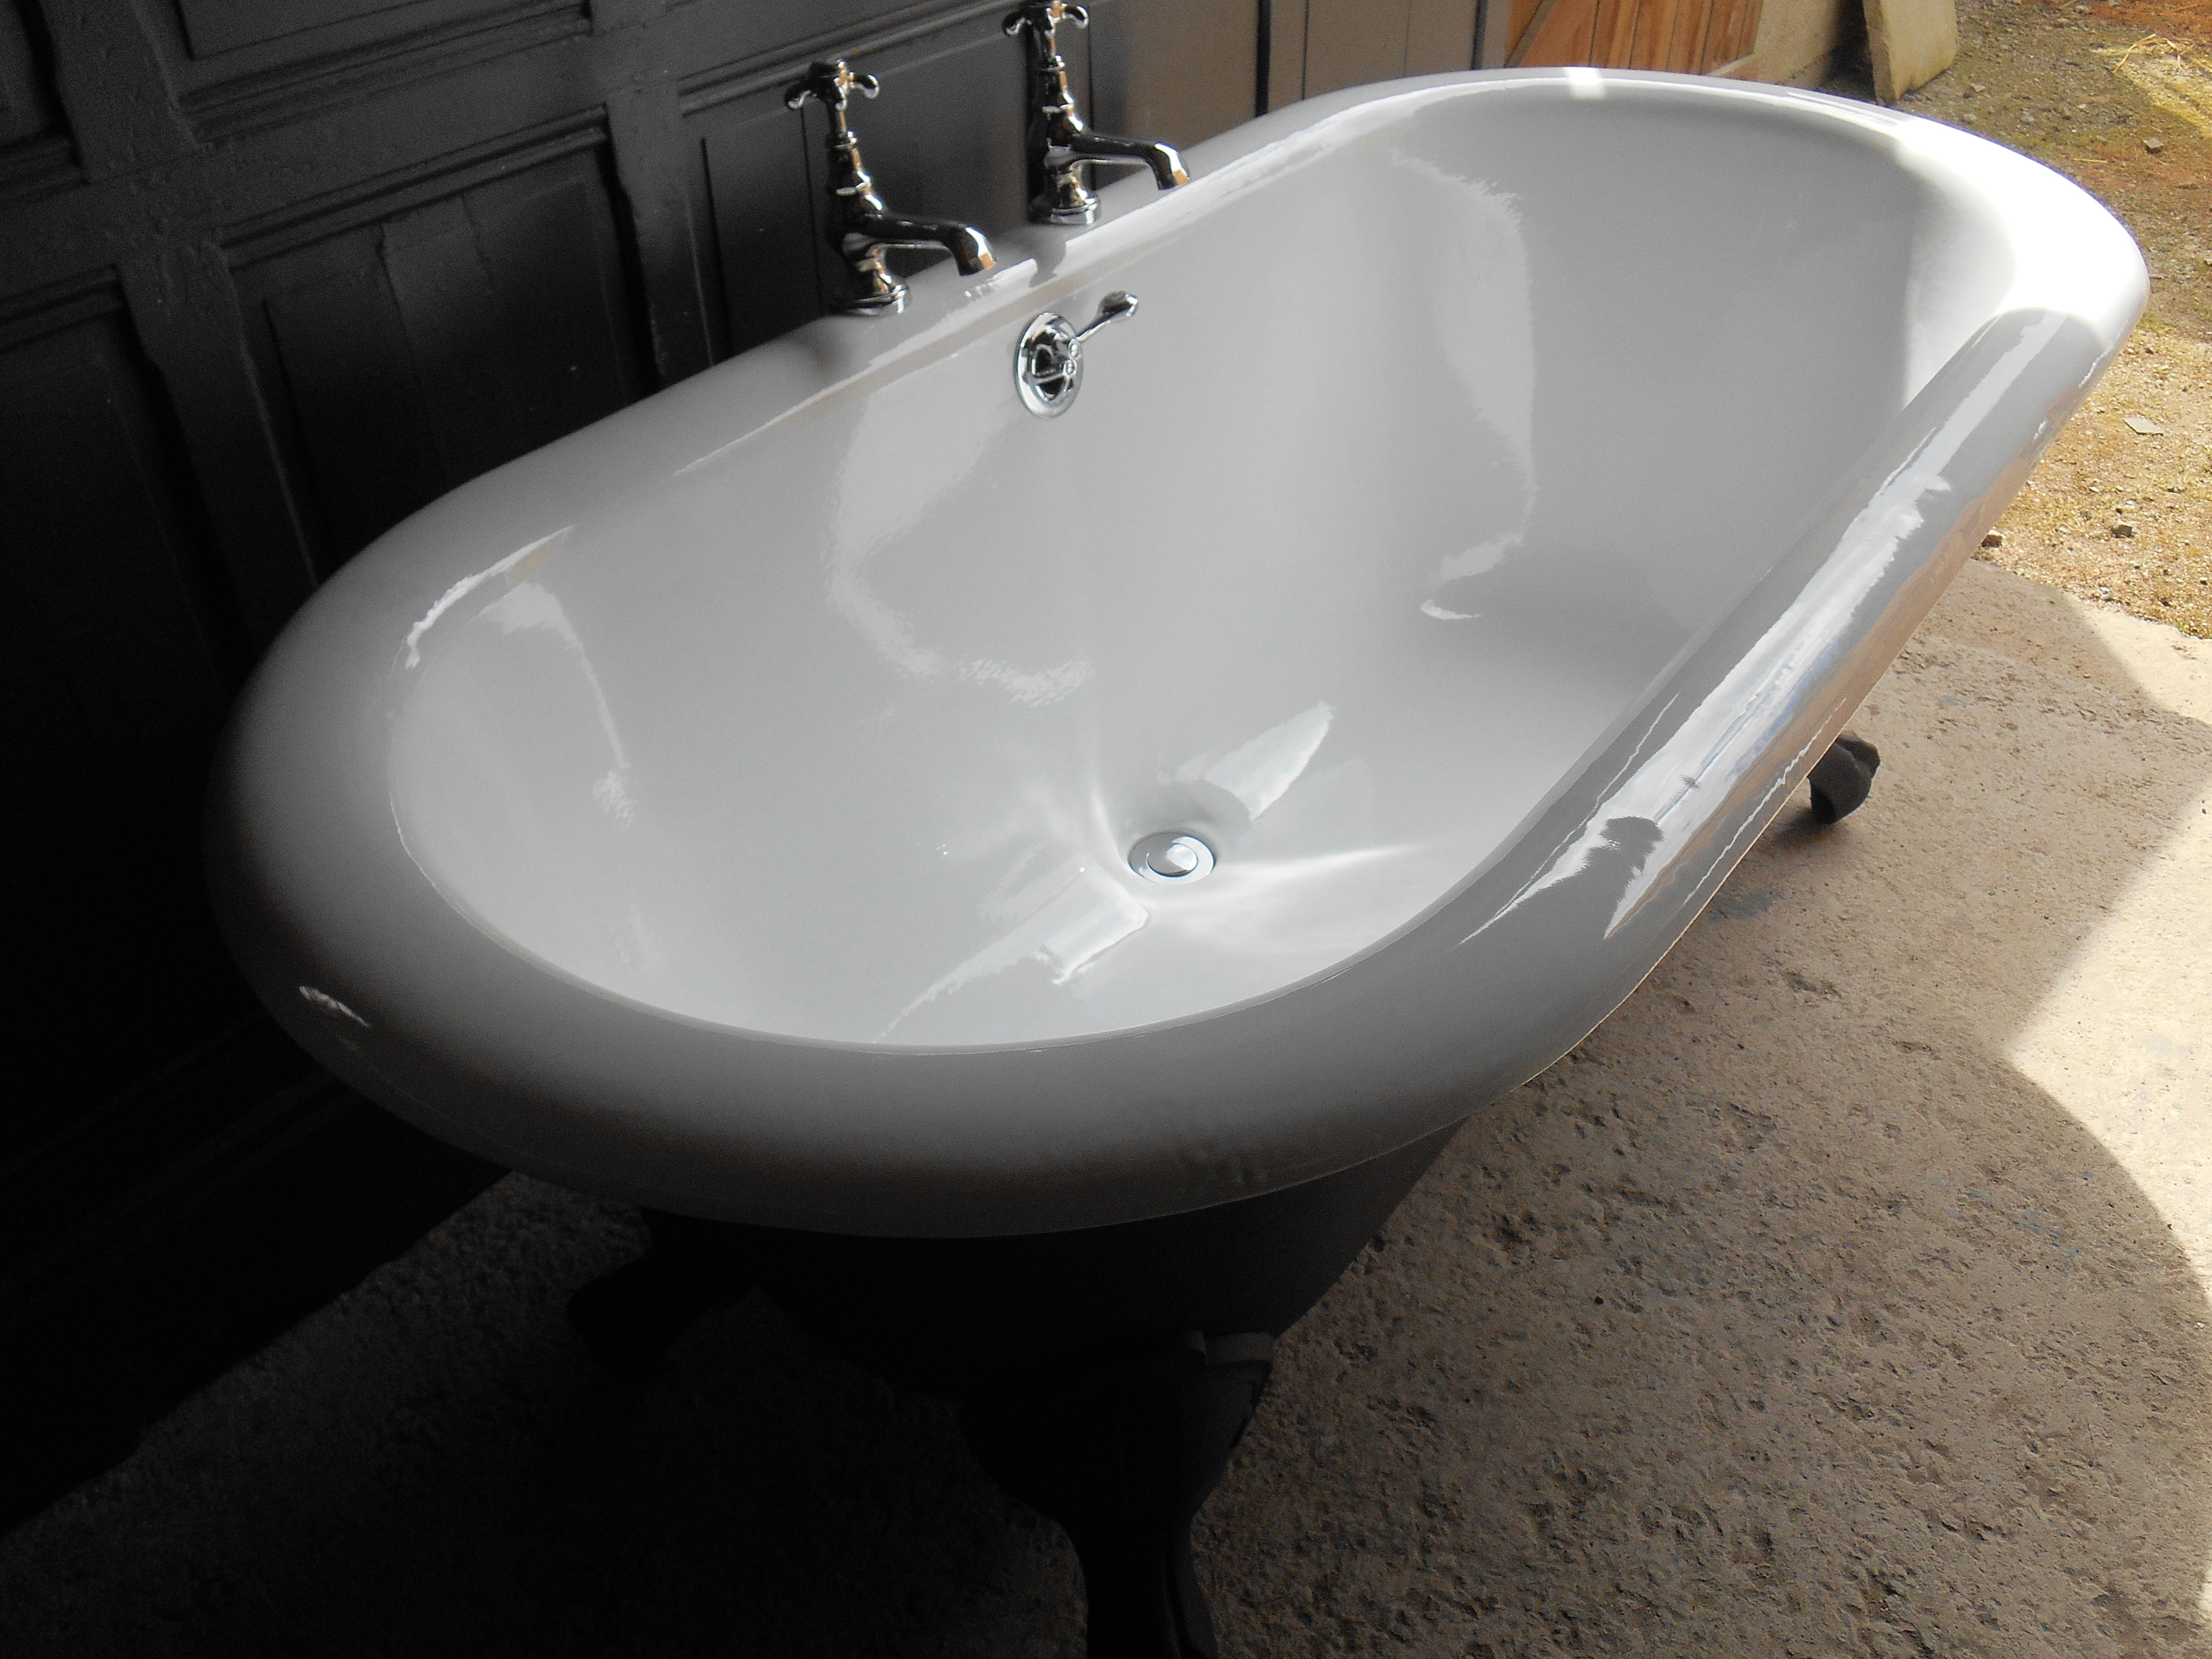 vieille baignoire en fonte gallery of superbe baignoire. Black Bedroom Furniture Sets. Home Design Ideas